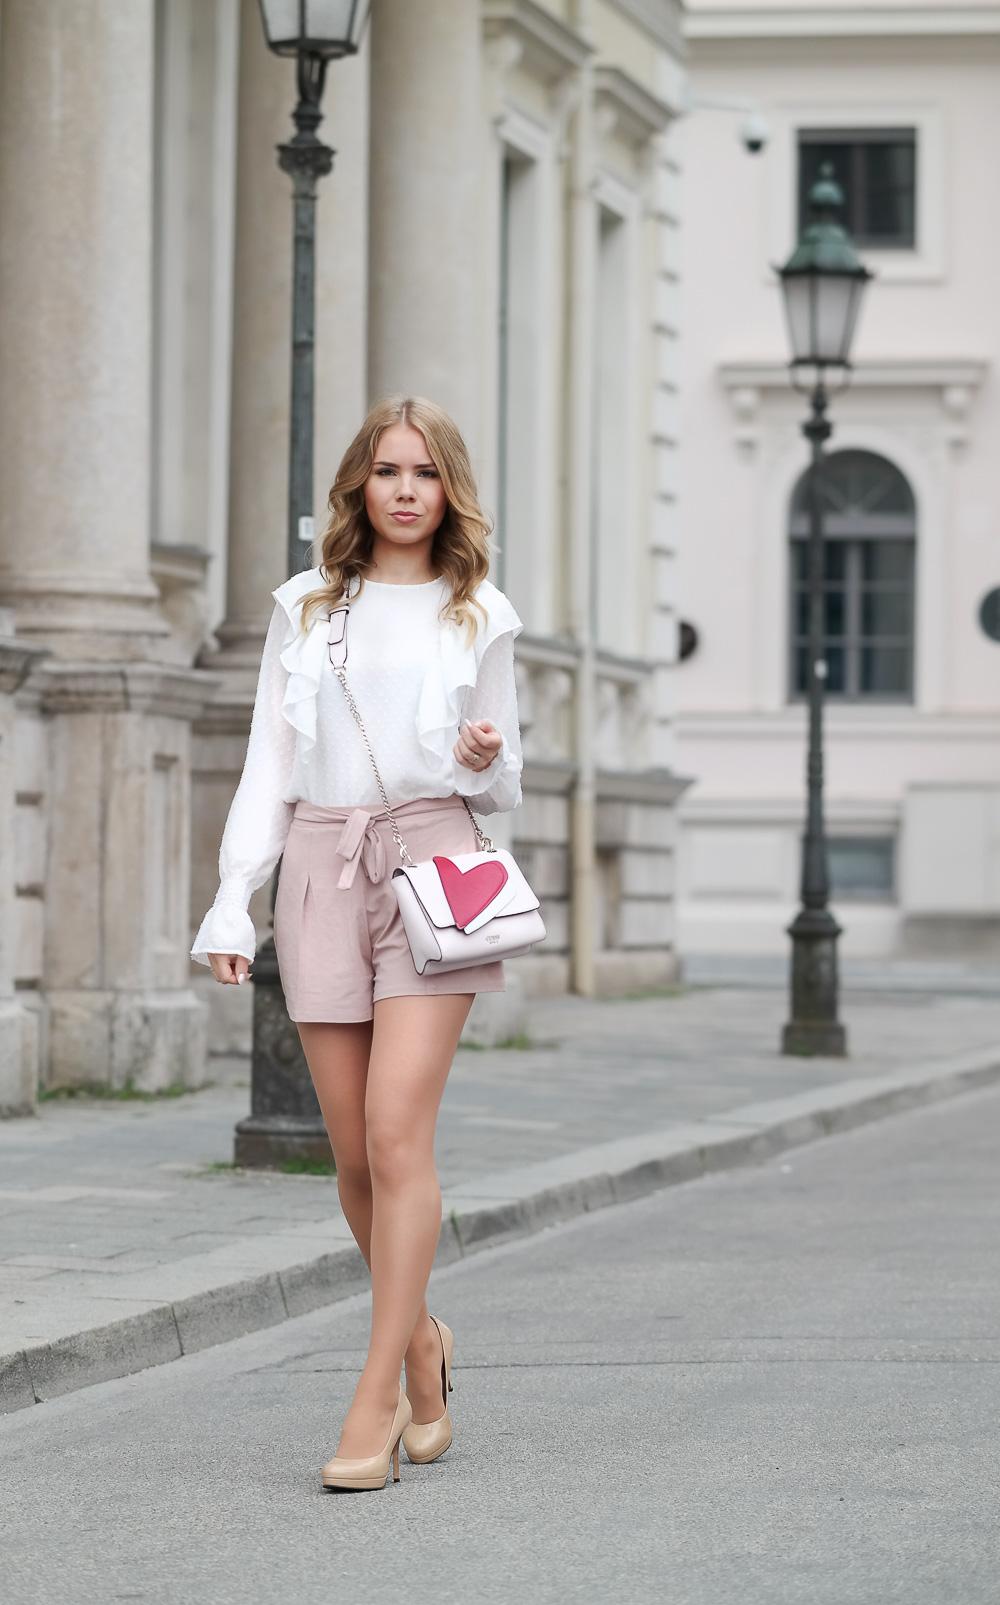 Styleblogger-Sommer Look Rüschen Volant High Waisted Shorts High Heels Guess Tasche